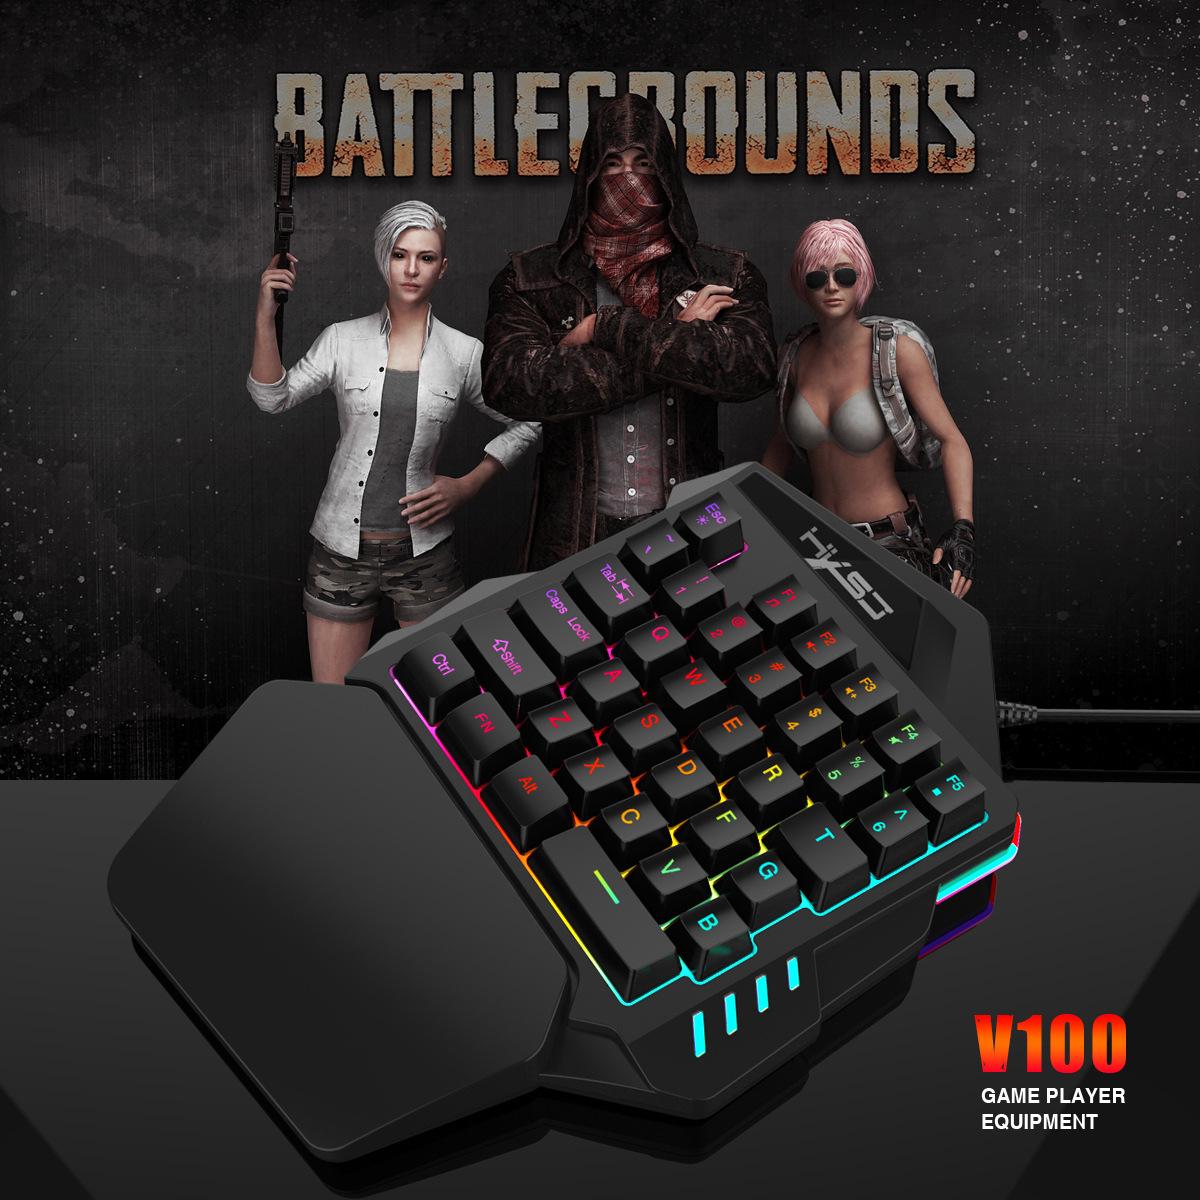 New Ergonomic Multicolor Backlight One-Handed Game Keyboard Mouse Set 35 Keys 5500DPI Gamer Gaming Mouse Keyboard Combos 12